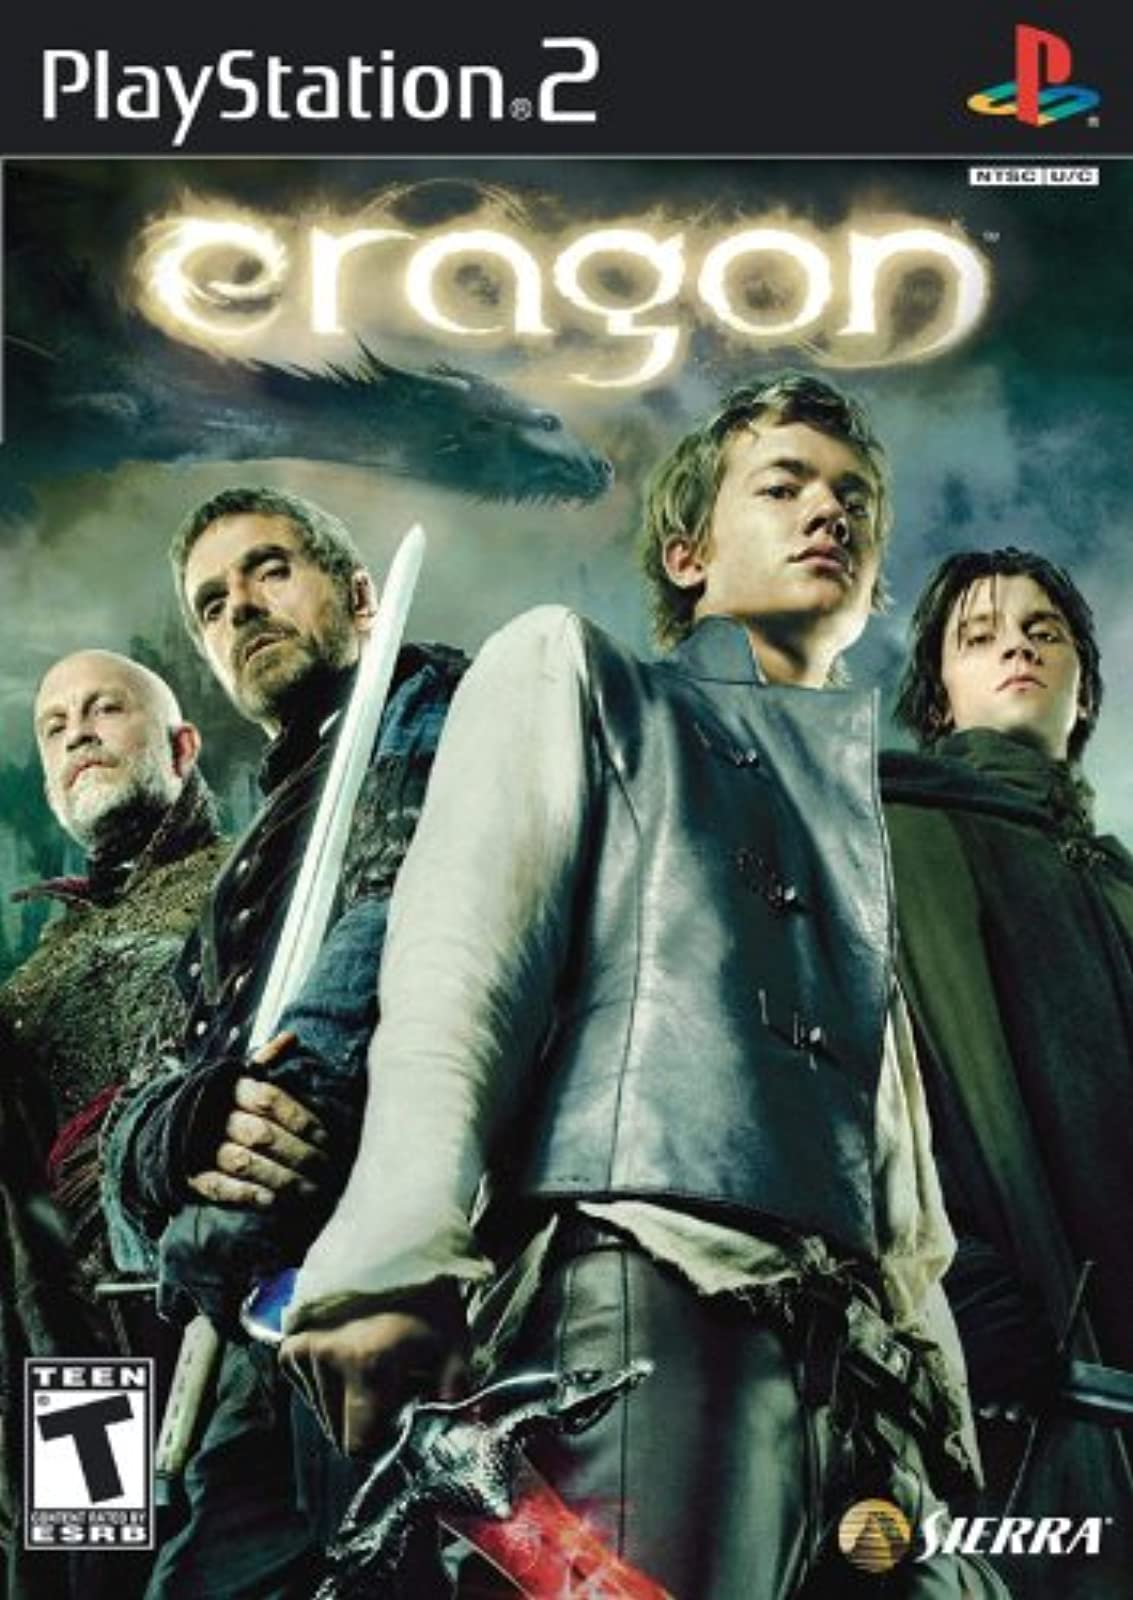 Eragon For PlayStation 2 PS2